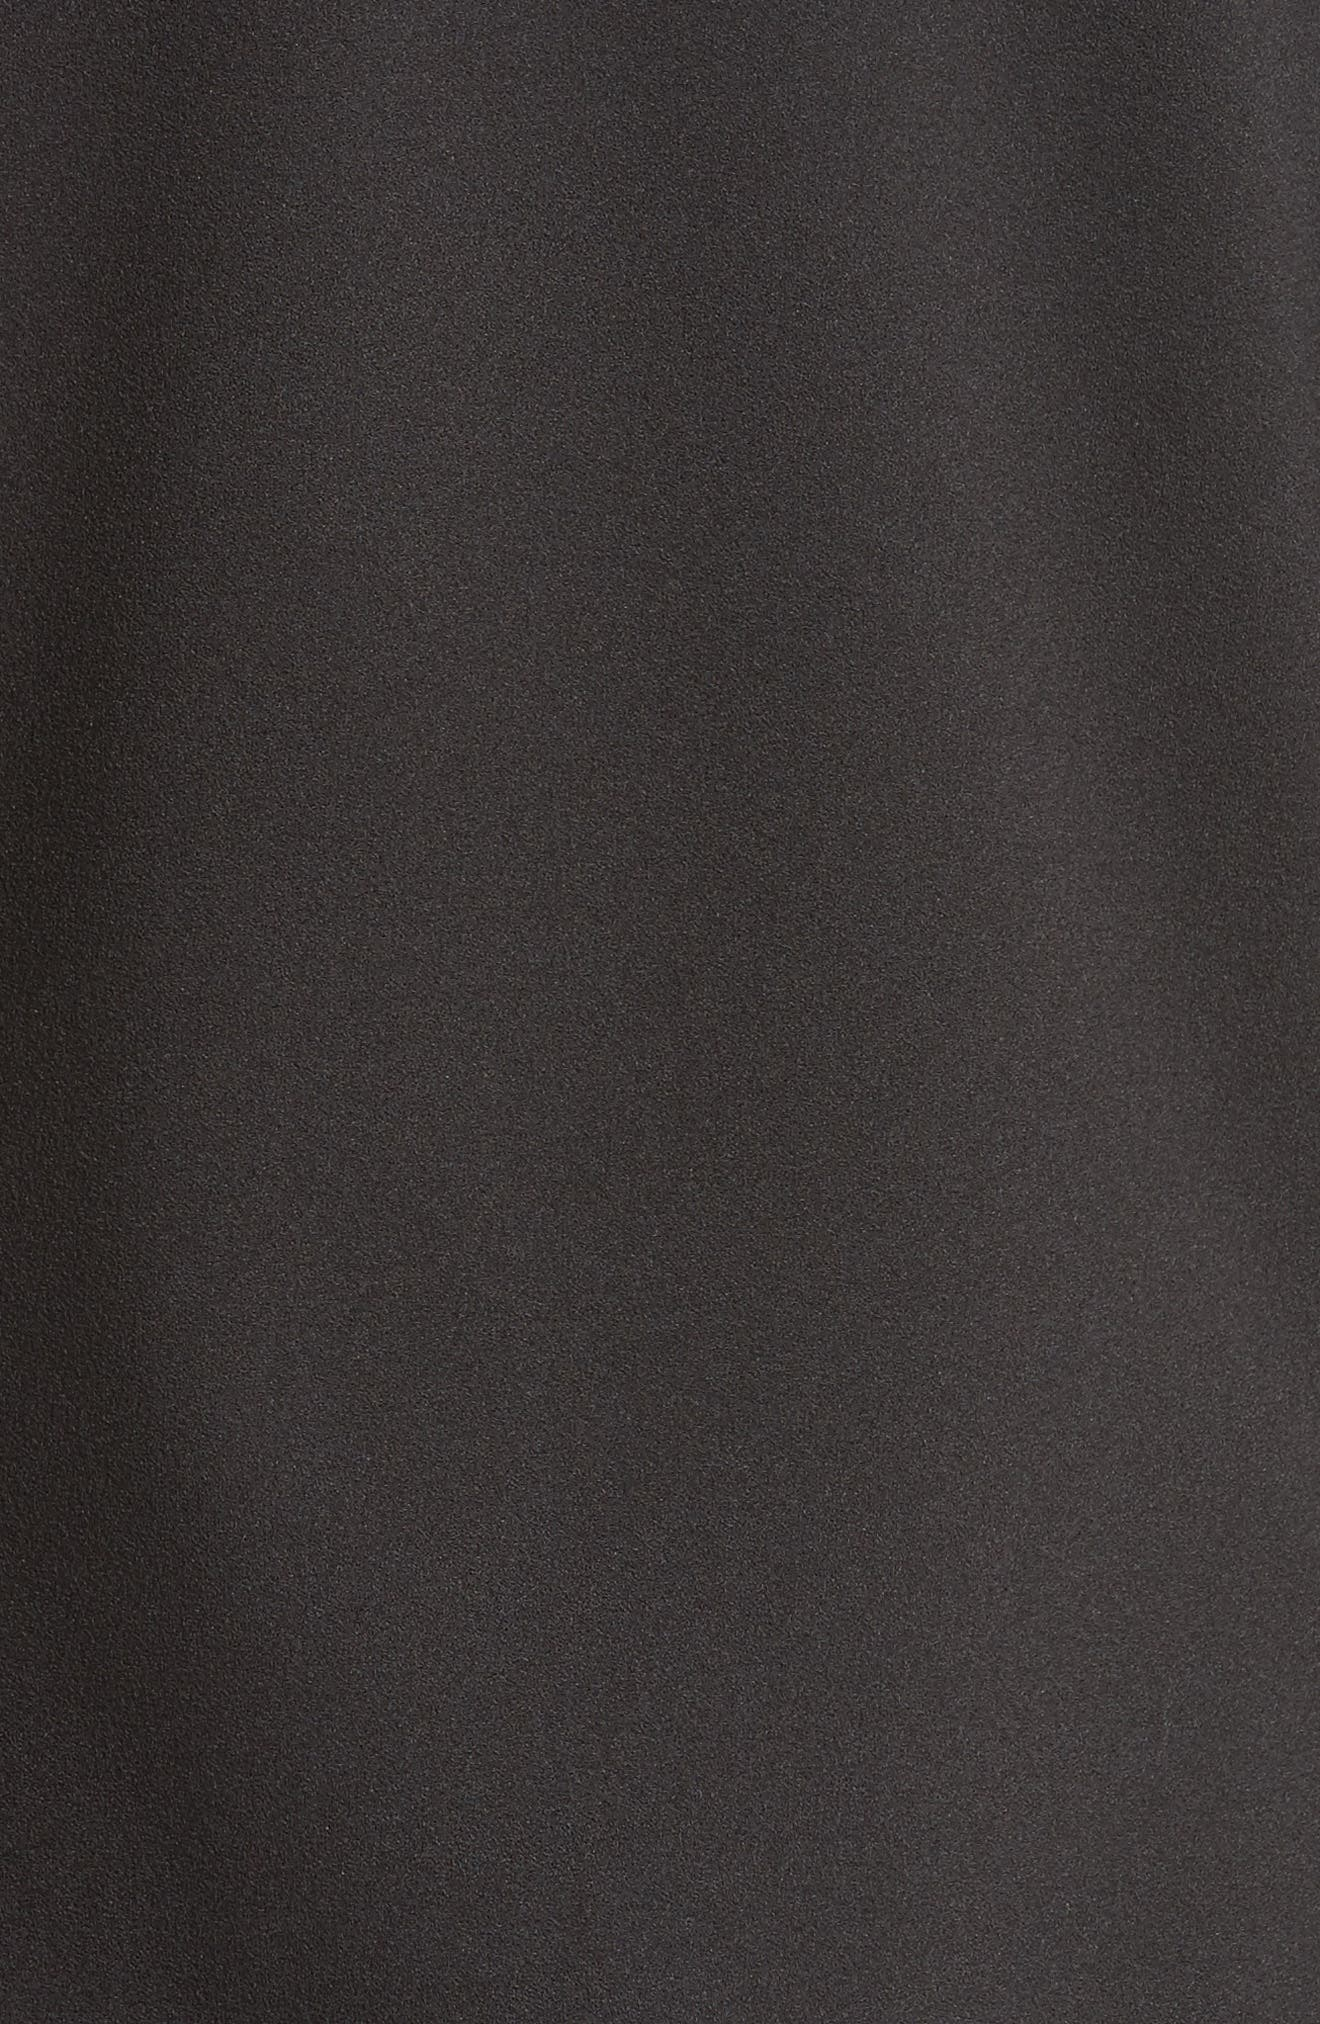 Shirred Stretch Crepe Top,                             Alternate thumbnail 5, color,                             Black